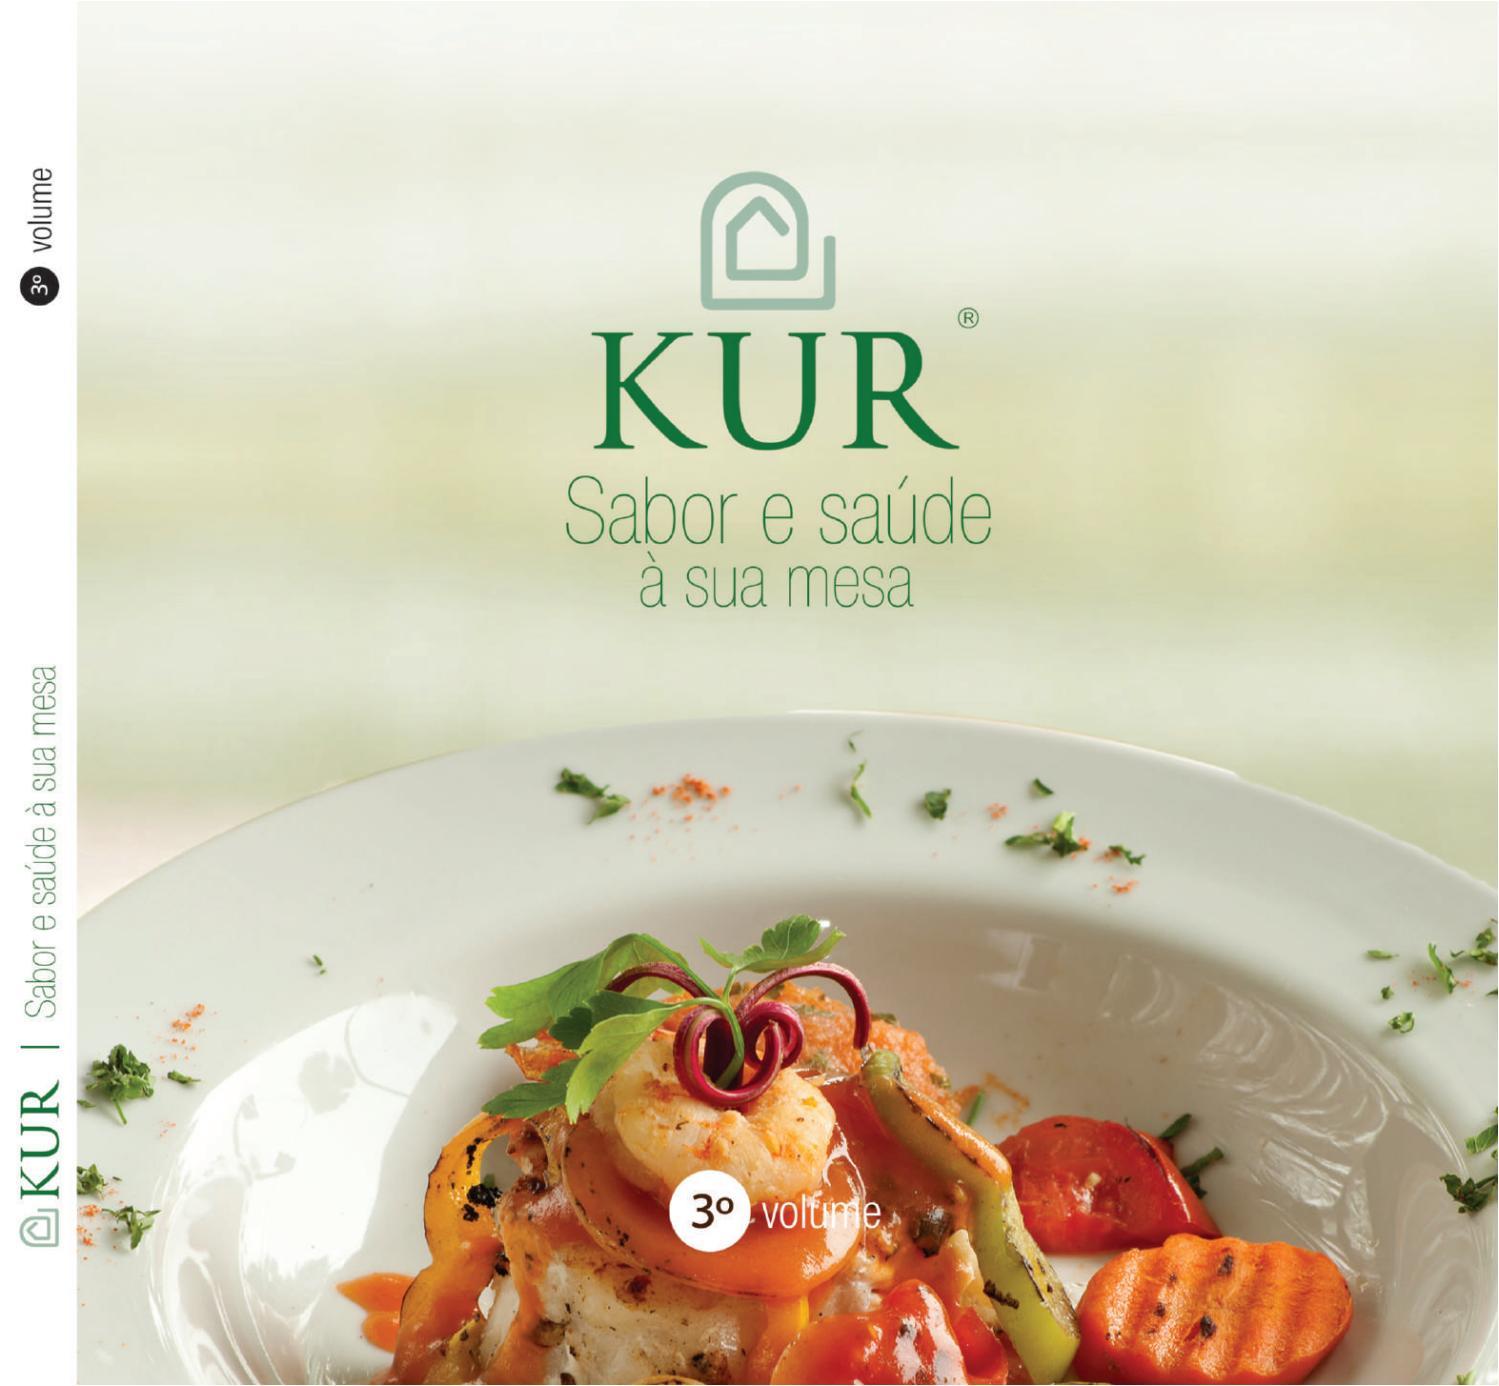 Gourmand Awards 2015 – Cookbooks by Edouard Cointreau - issuu